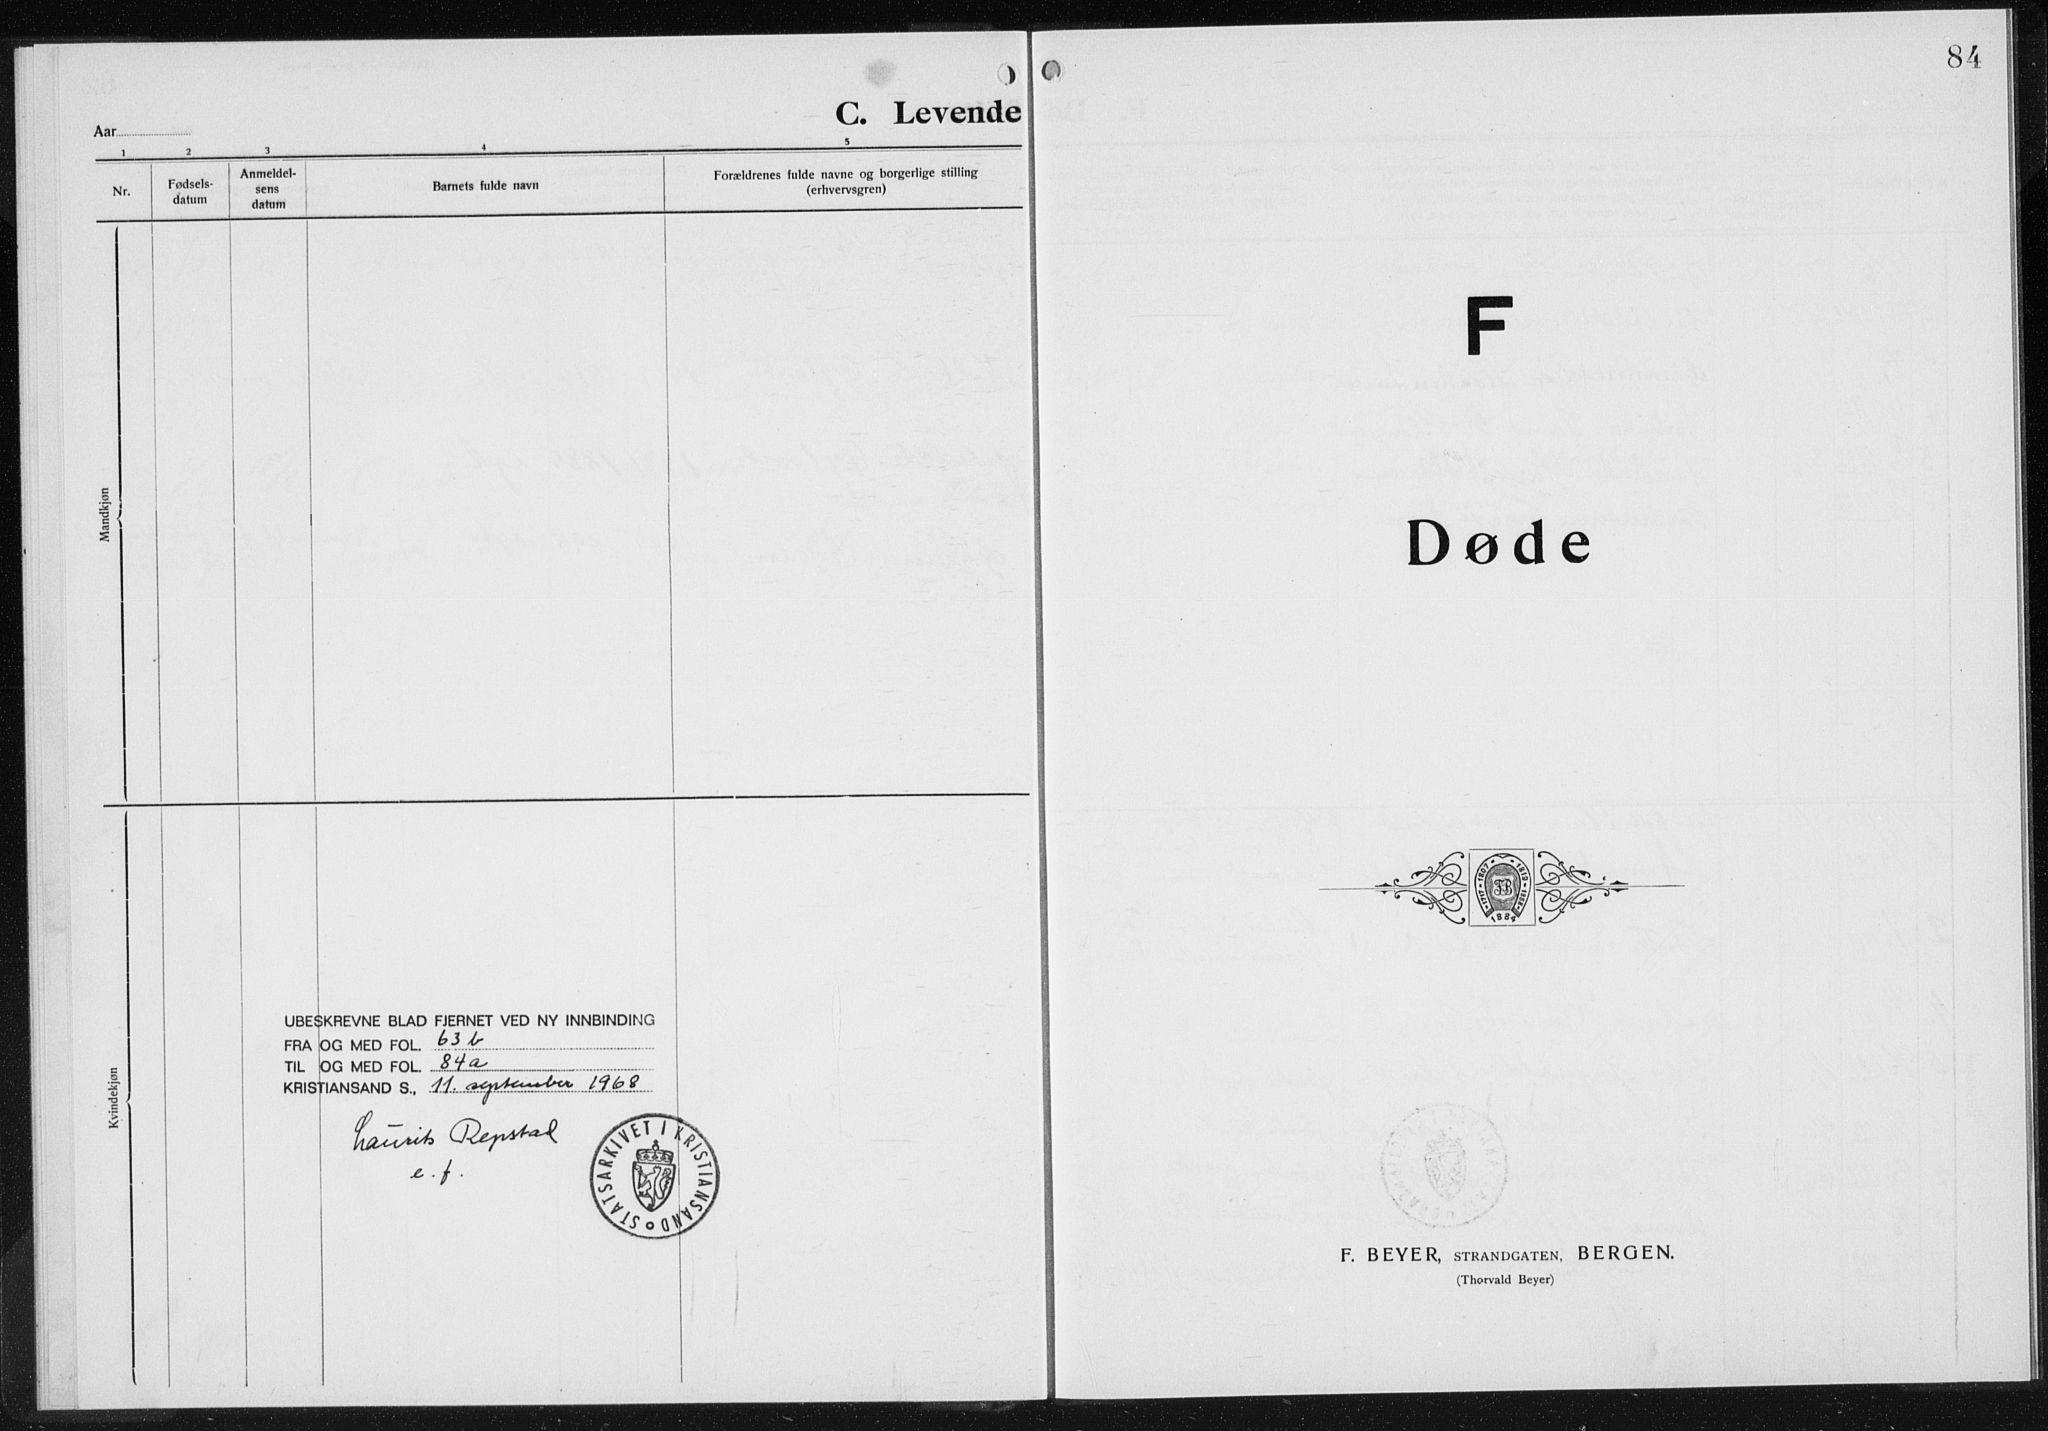 SAK, Baptistmenigheten i Gyland, F/Fa/L0001: Dissenter register no. F 1, 1902-1937, p. 84